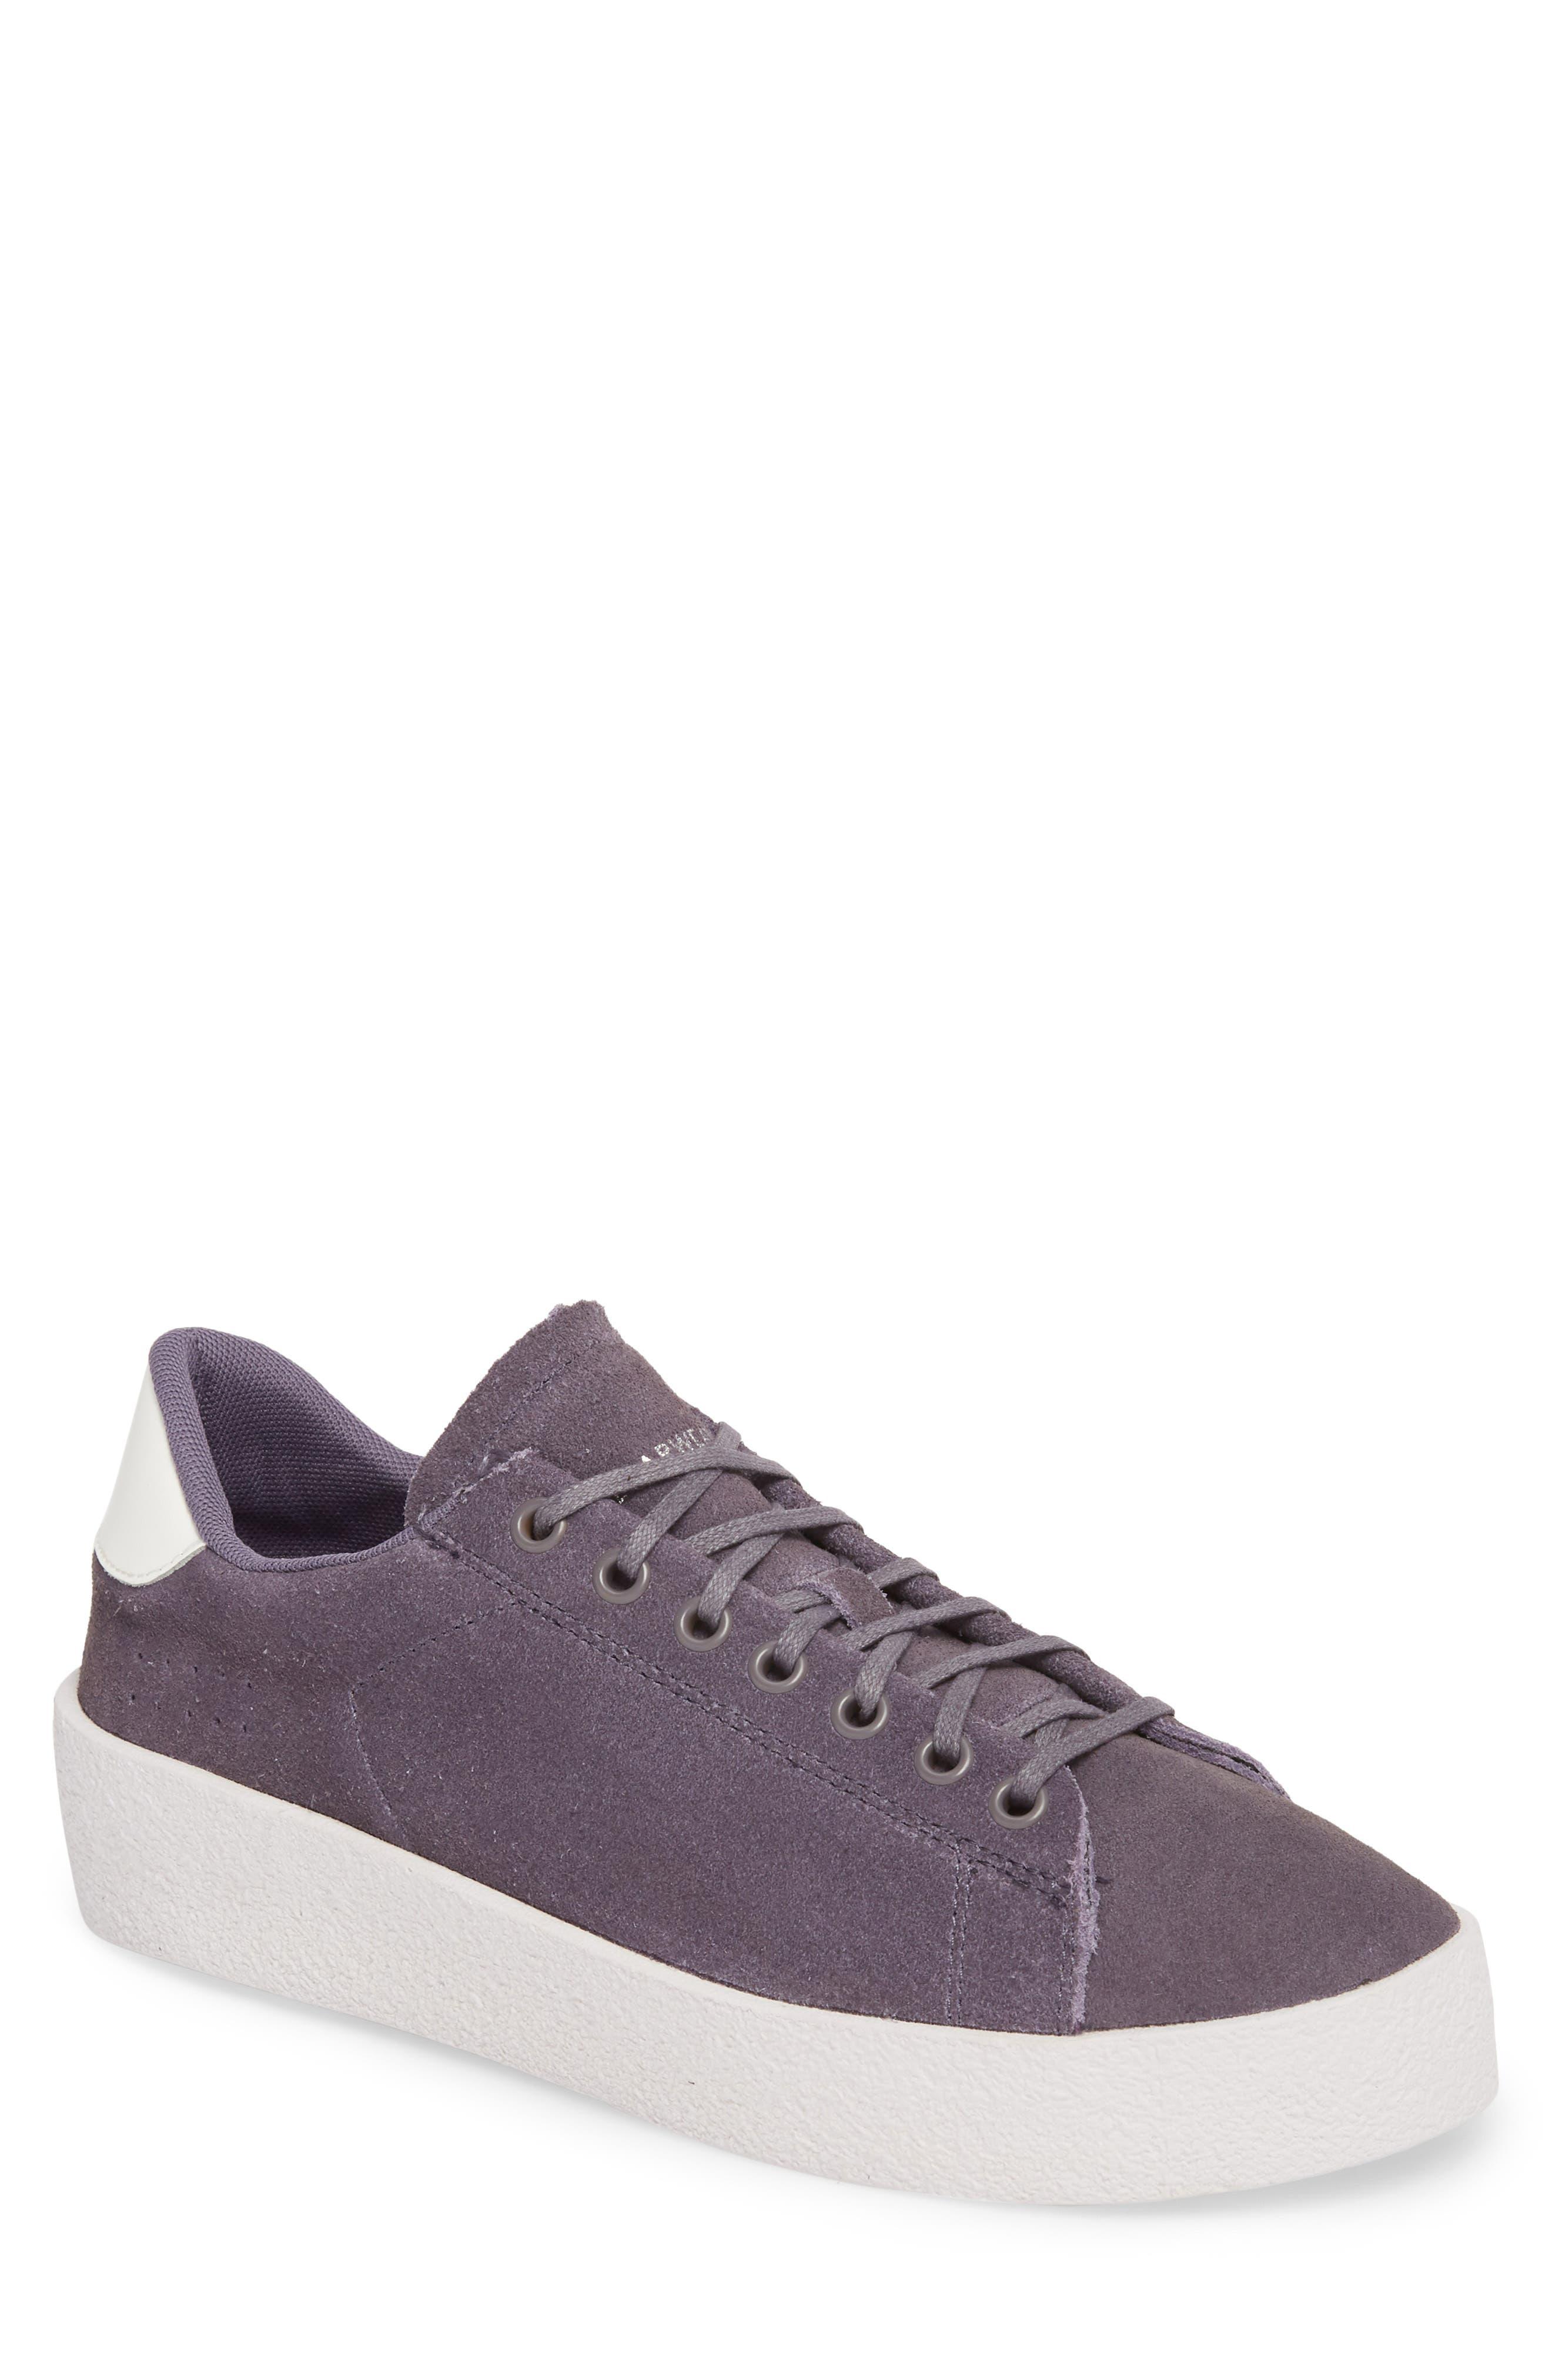 Jones Platform Sneaker,                         Main,                         color, Purple Leather